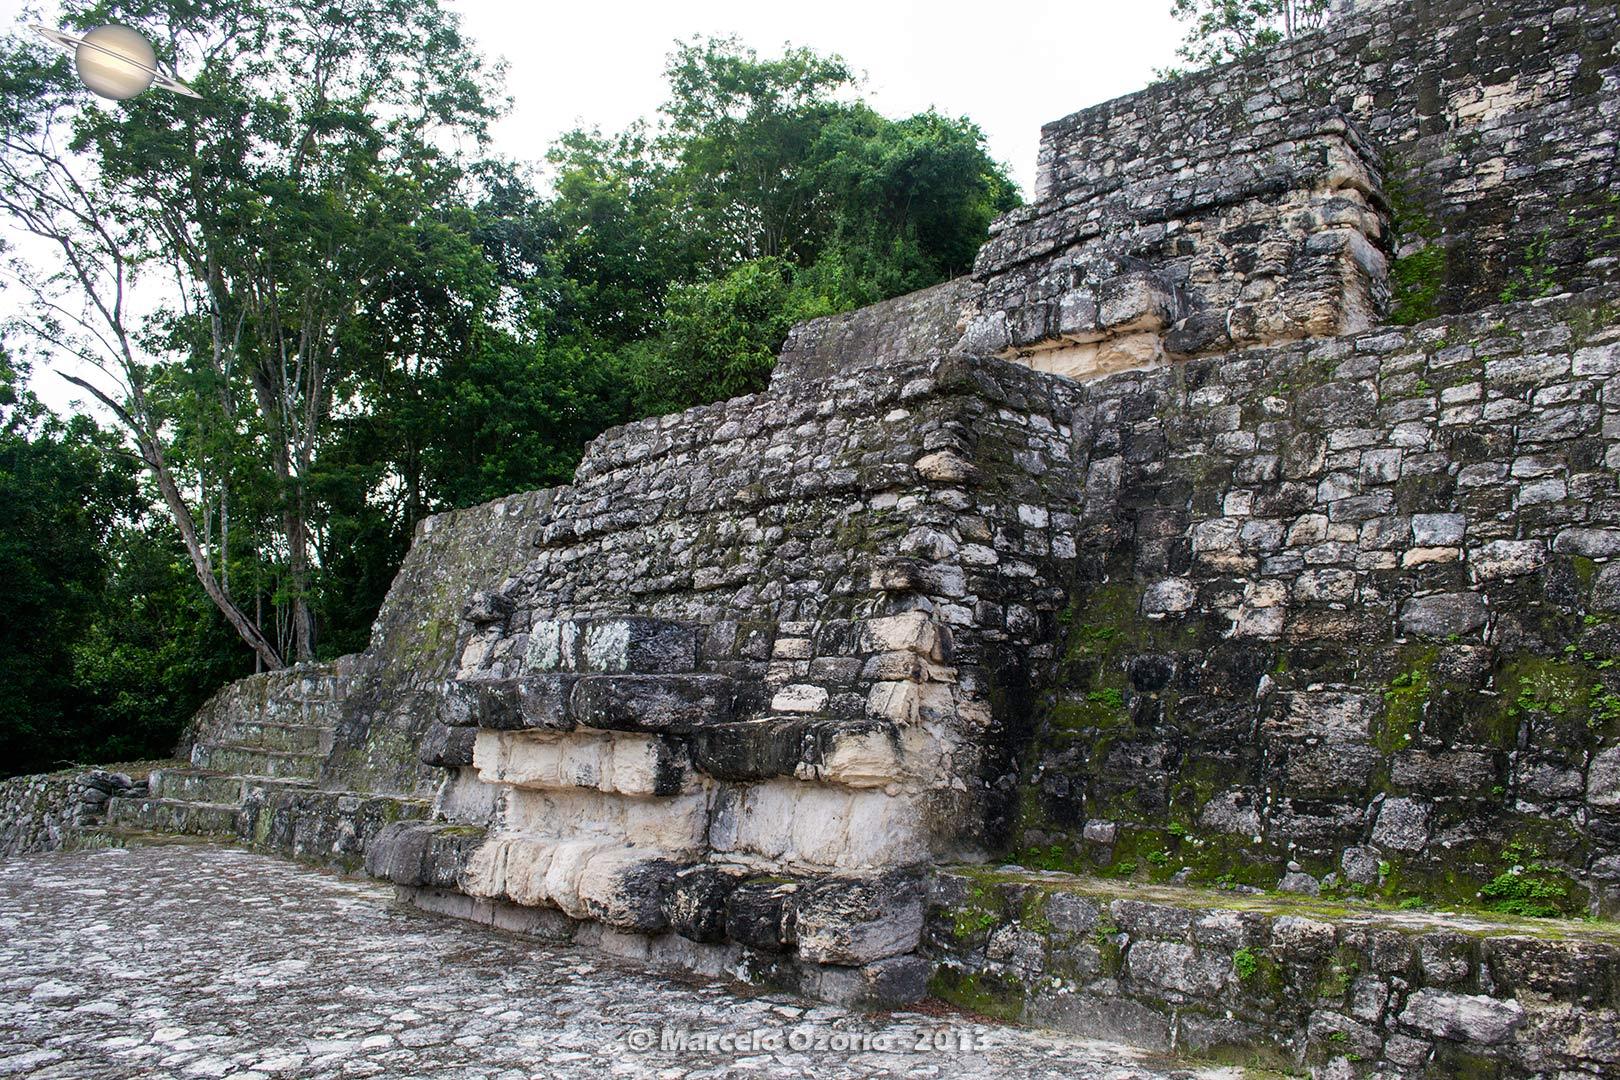 calakmul mayan civilization mexico 8 - Calakmul, City of the Two Adjacent Pyramids - Mexico